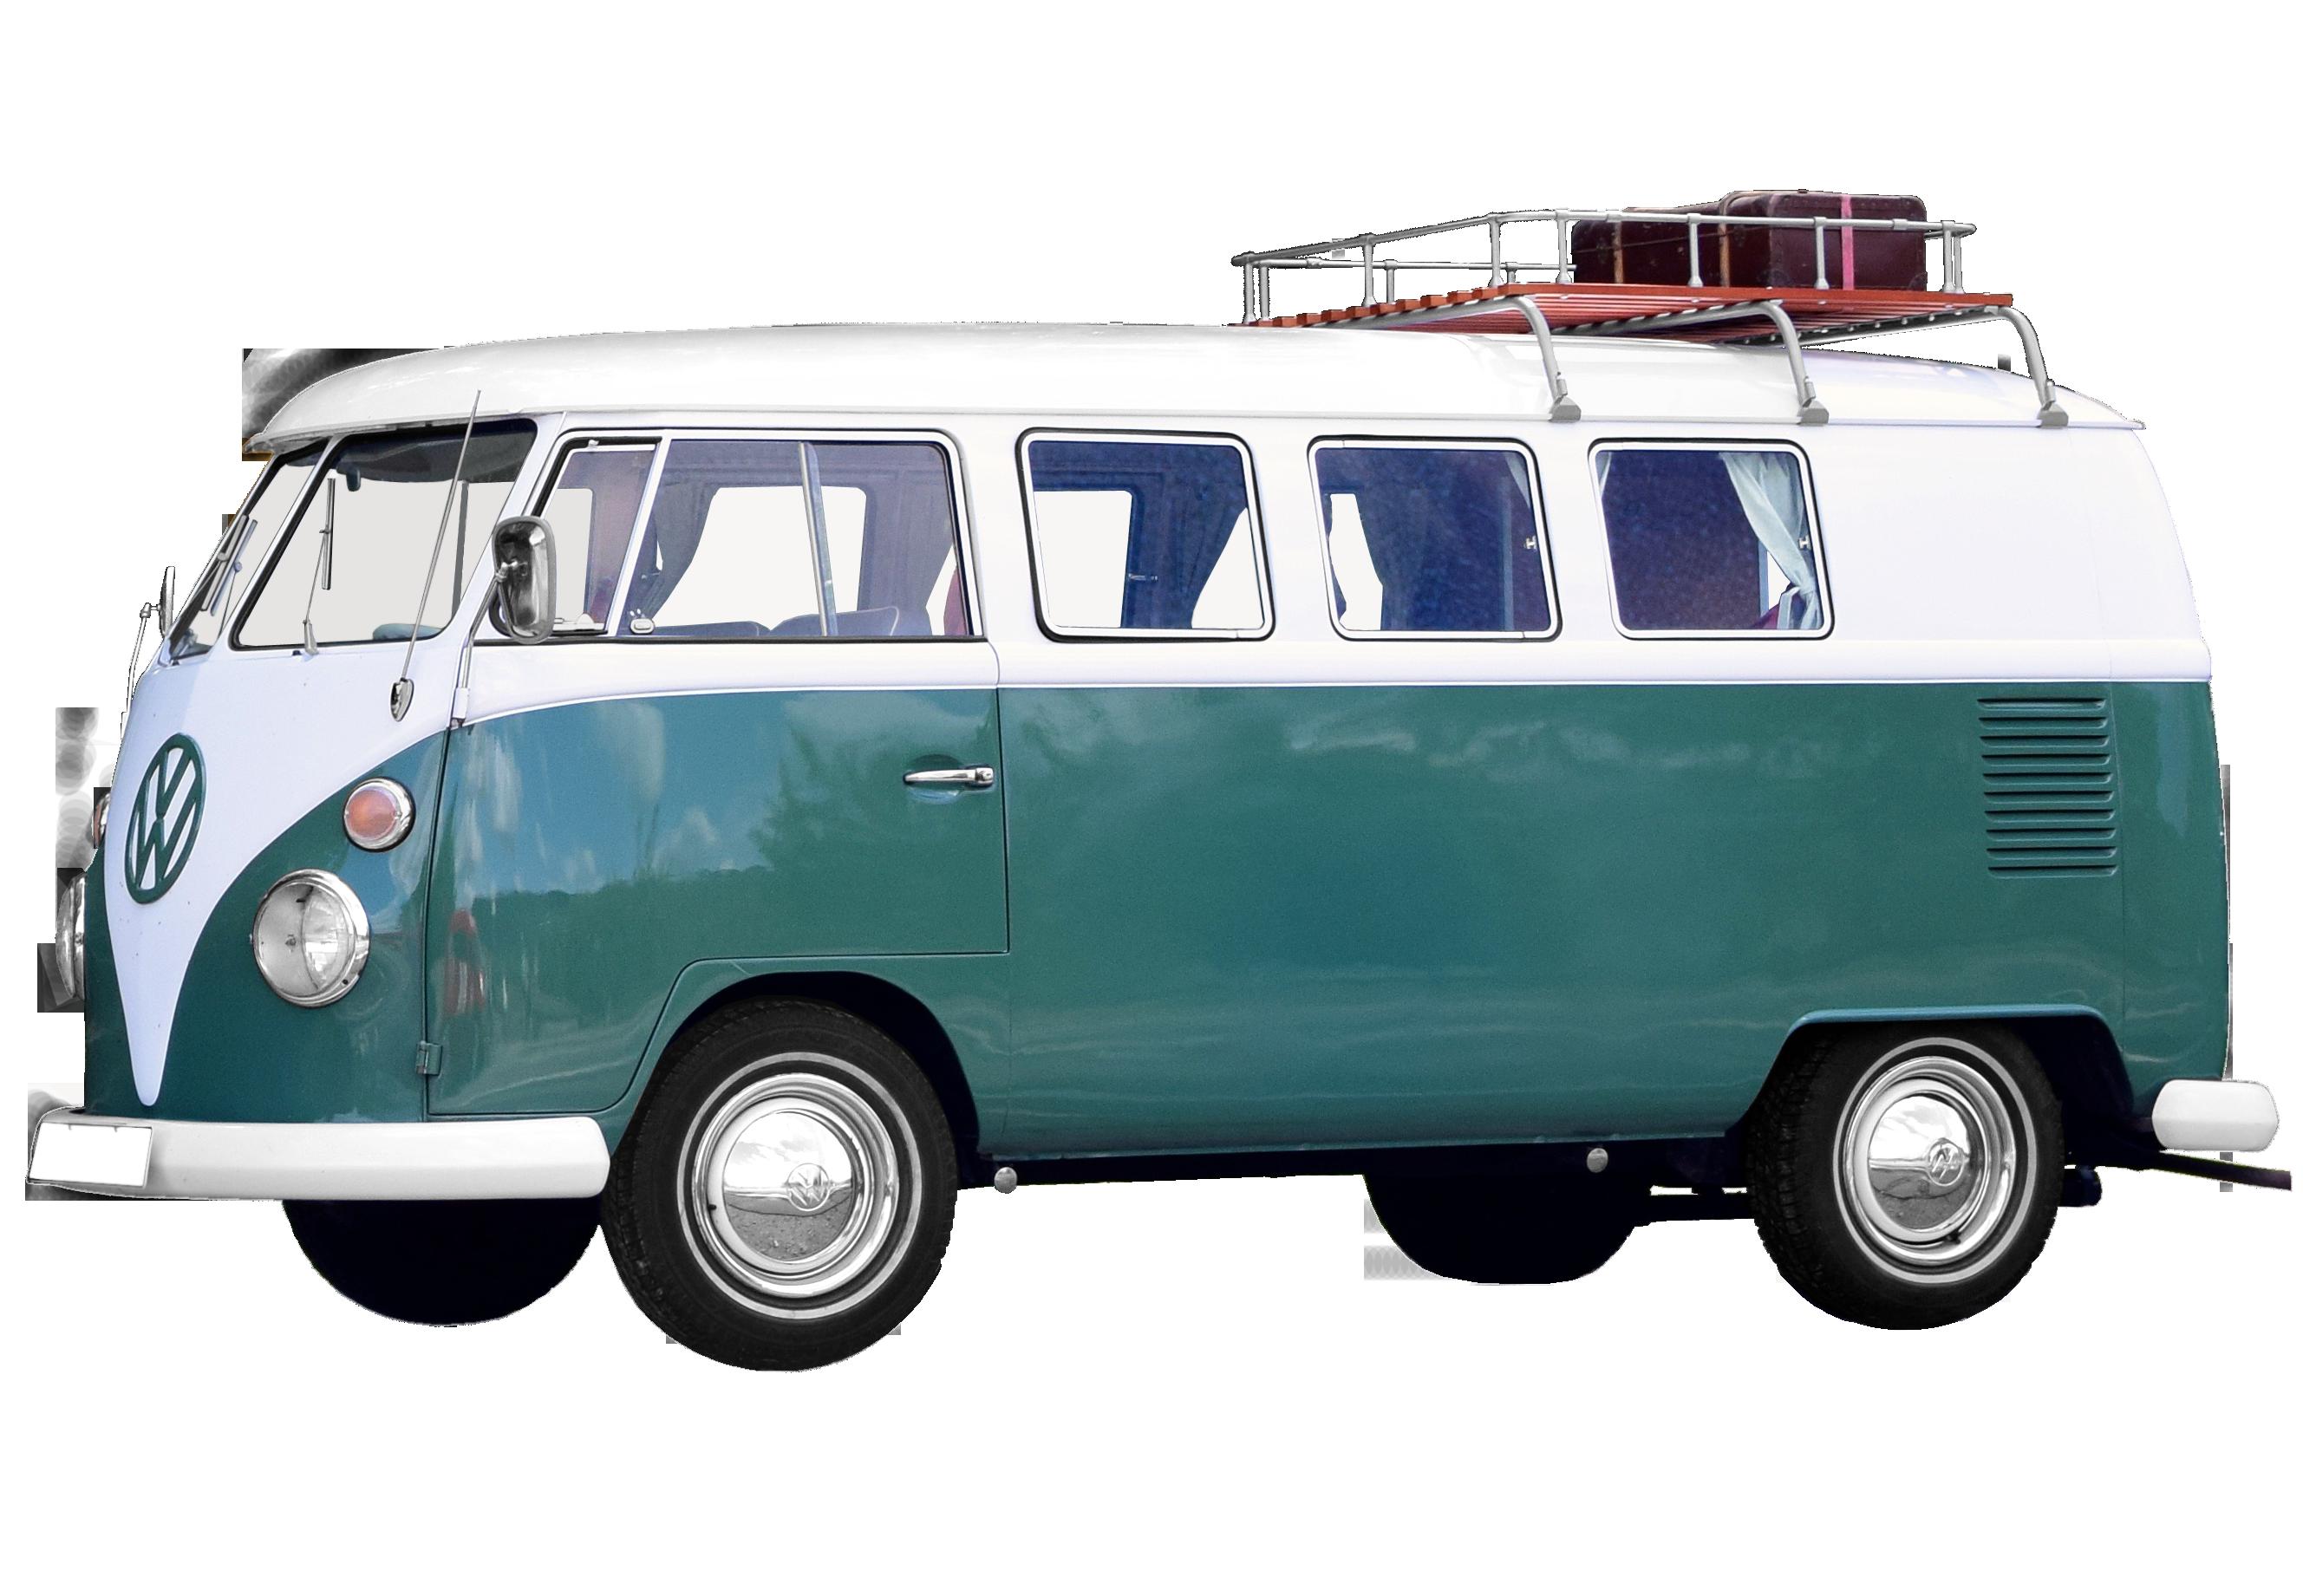 Volkswagen Bus Png & Free Volkswagen Bus.png Transparent Images.